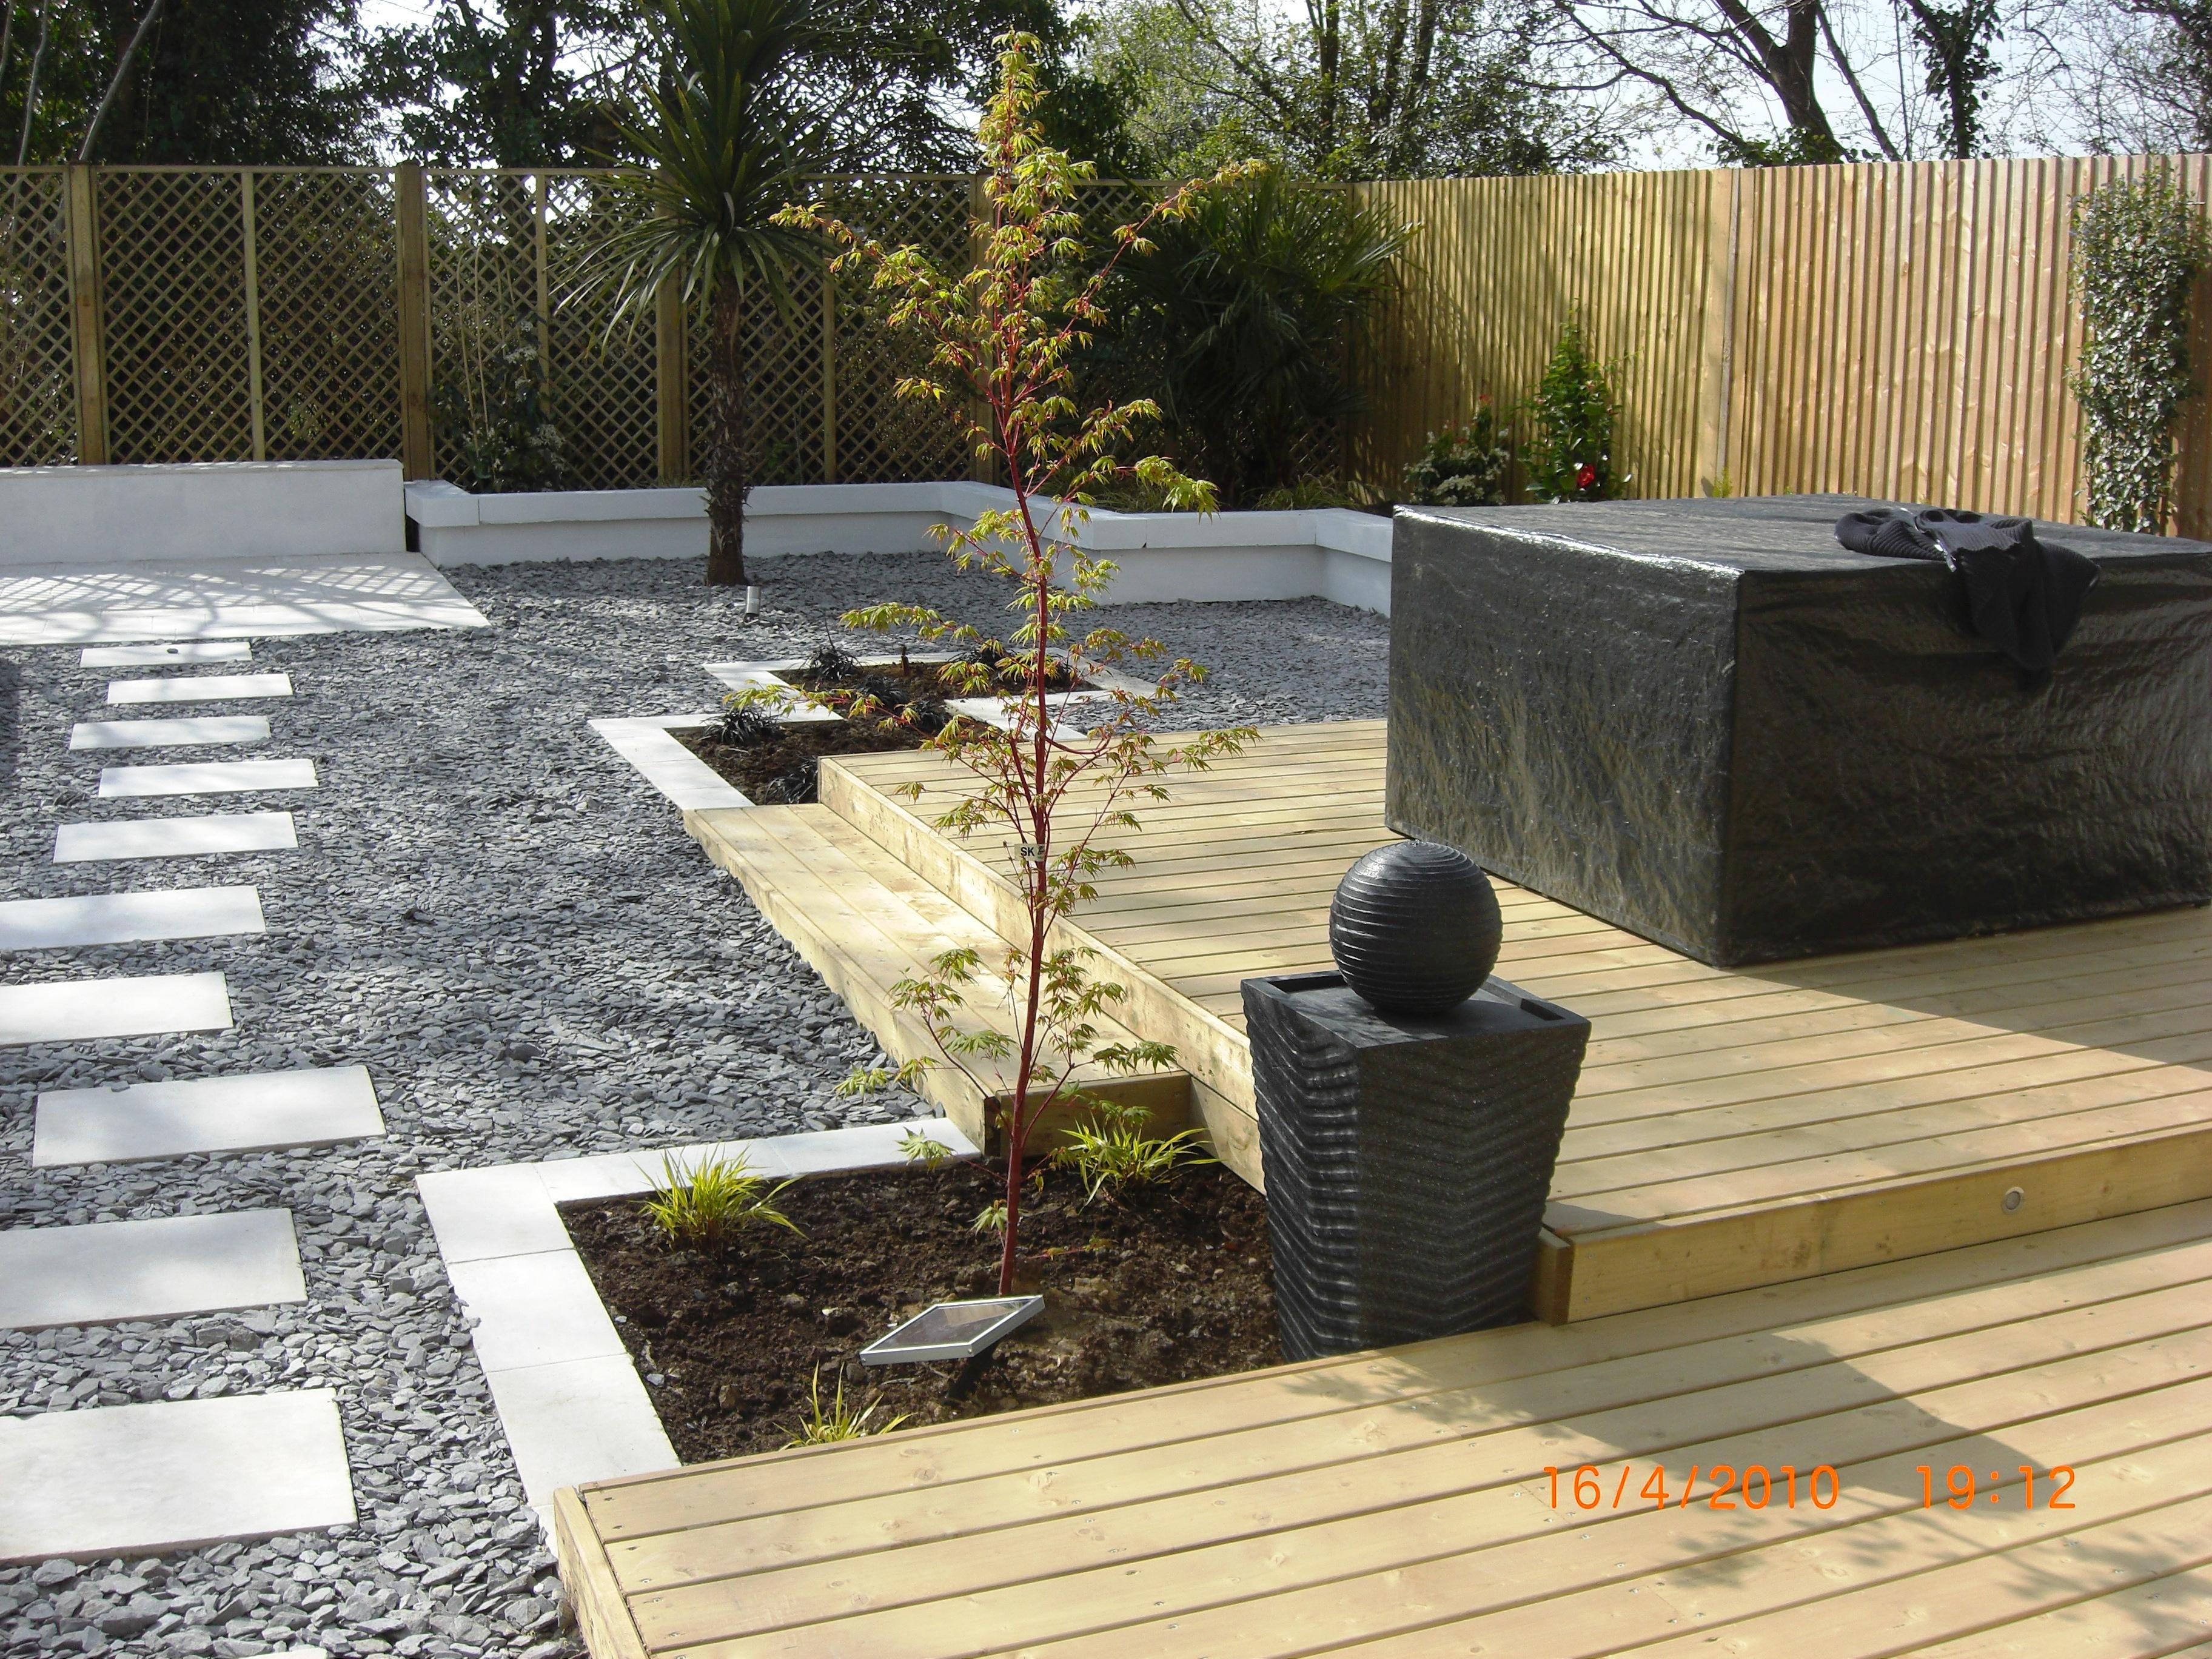 Landart garden design build ltd landscape contractors for Landscape design build